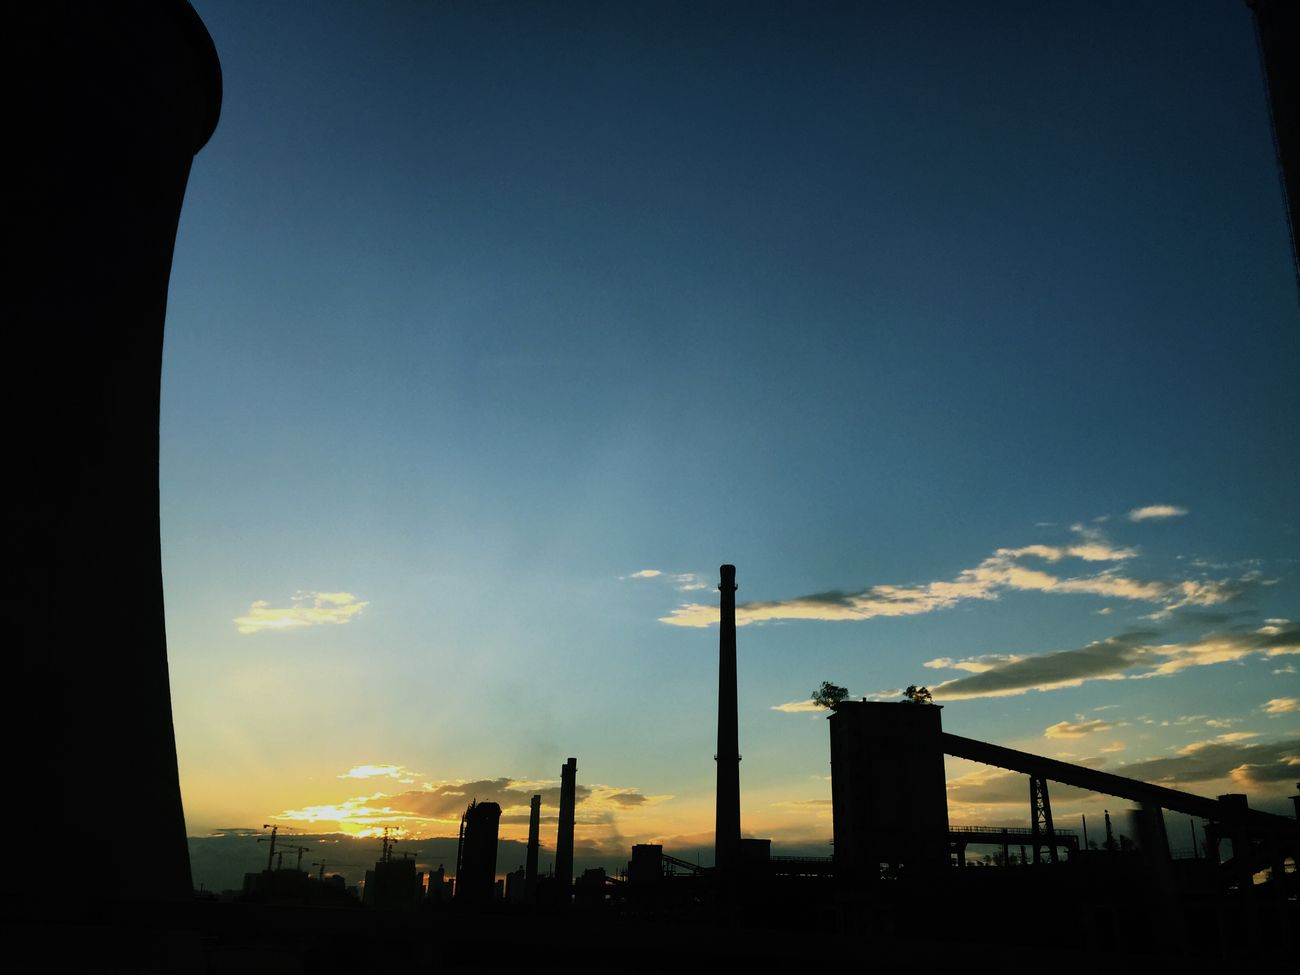 Hello World Cheese! Sunstet City Taking Photos On The Road OpenEdit Enjoying The View Beautiful ♥ Light